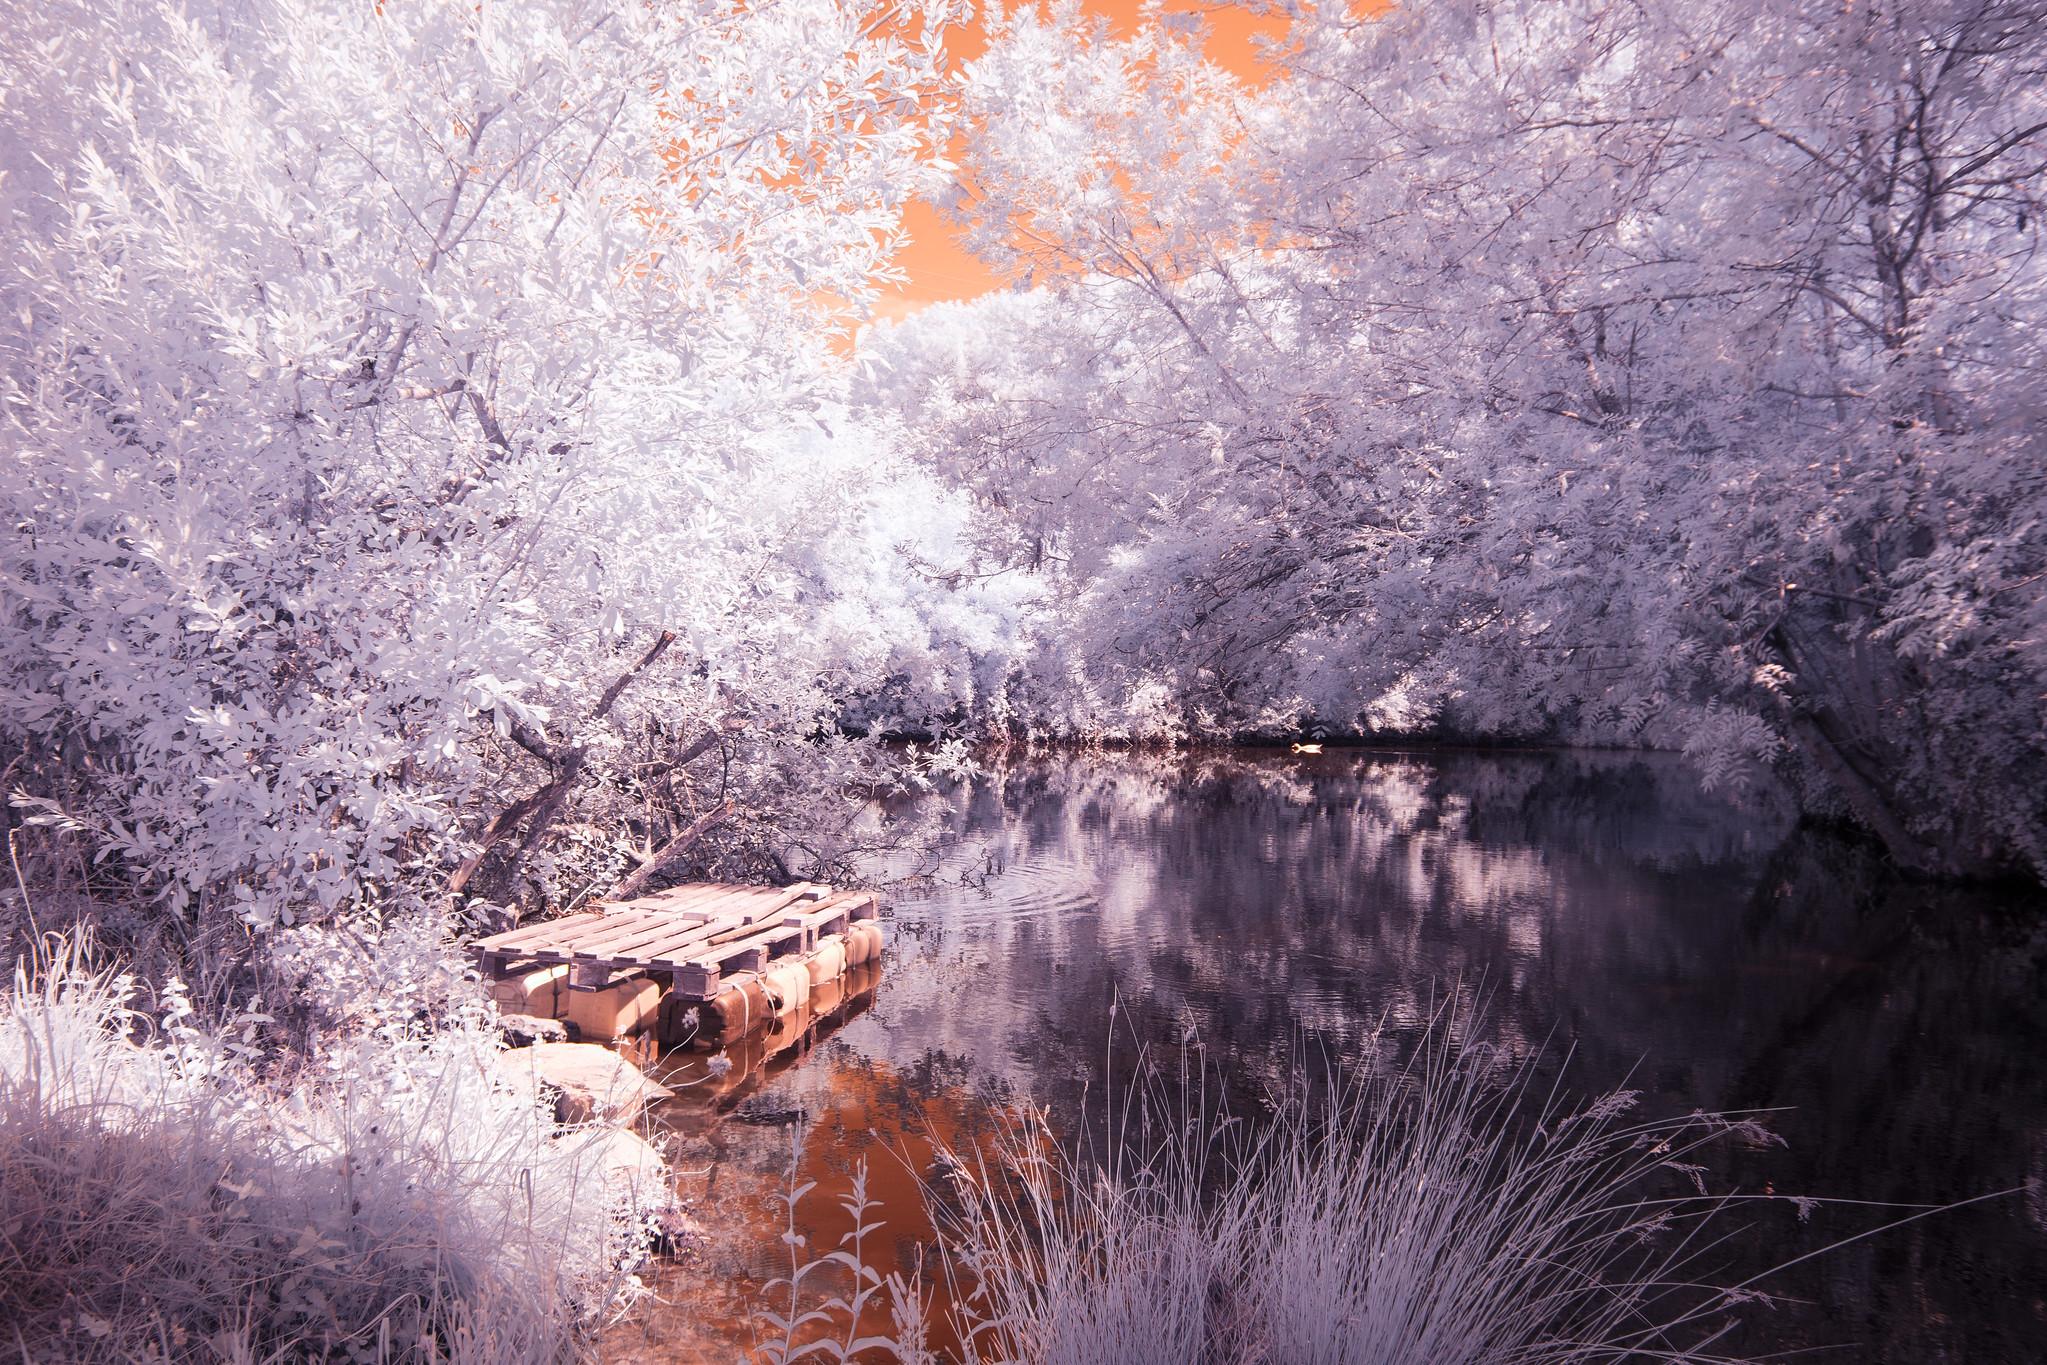 Pond & Raft